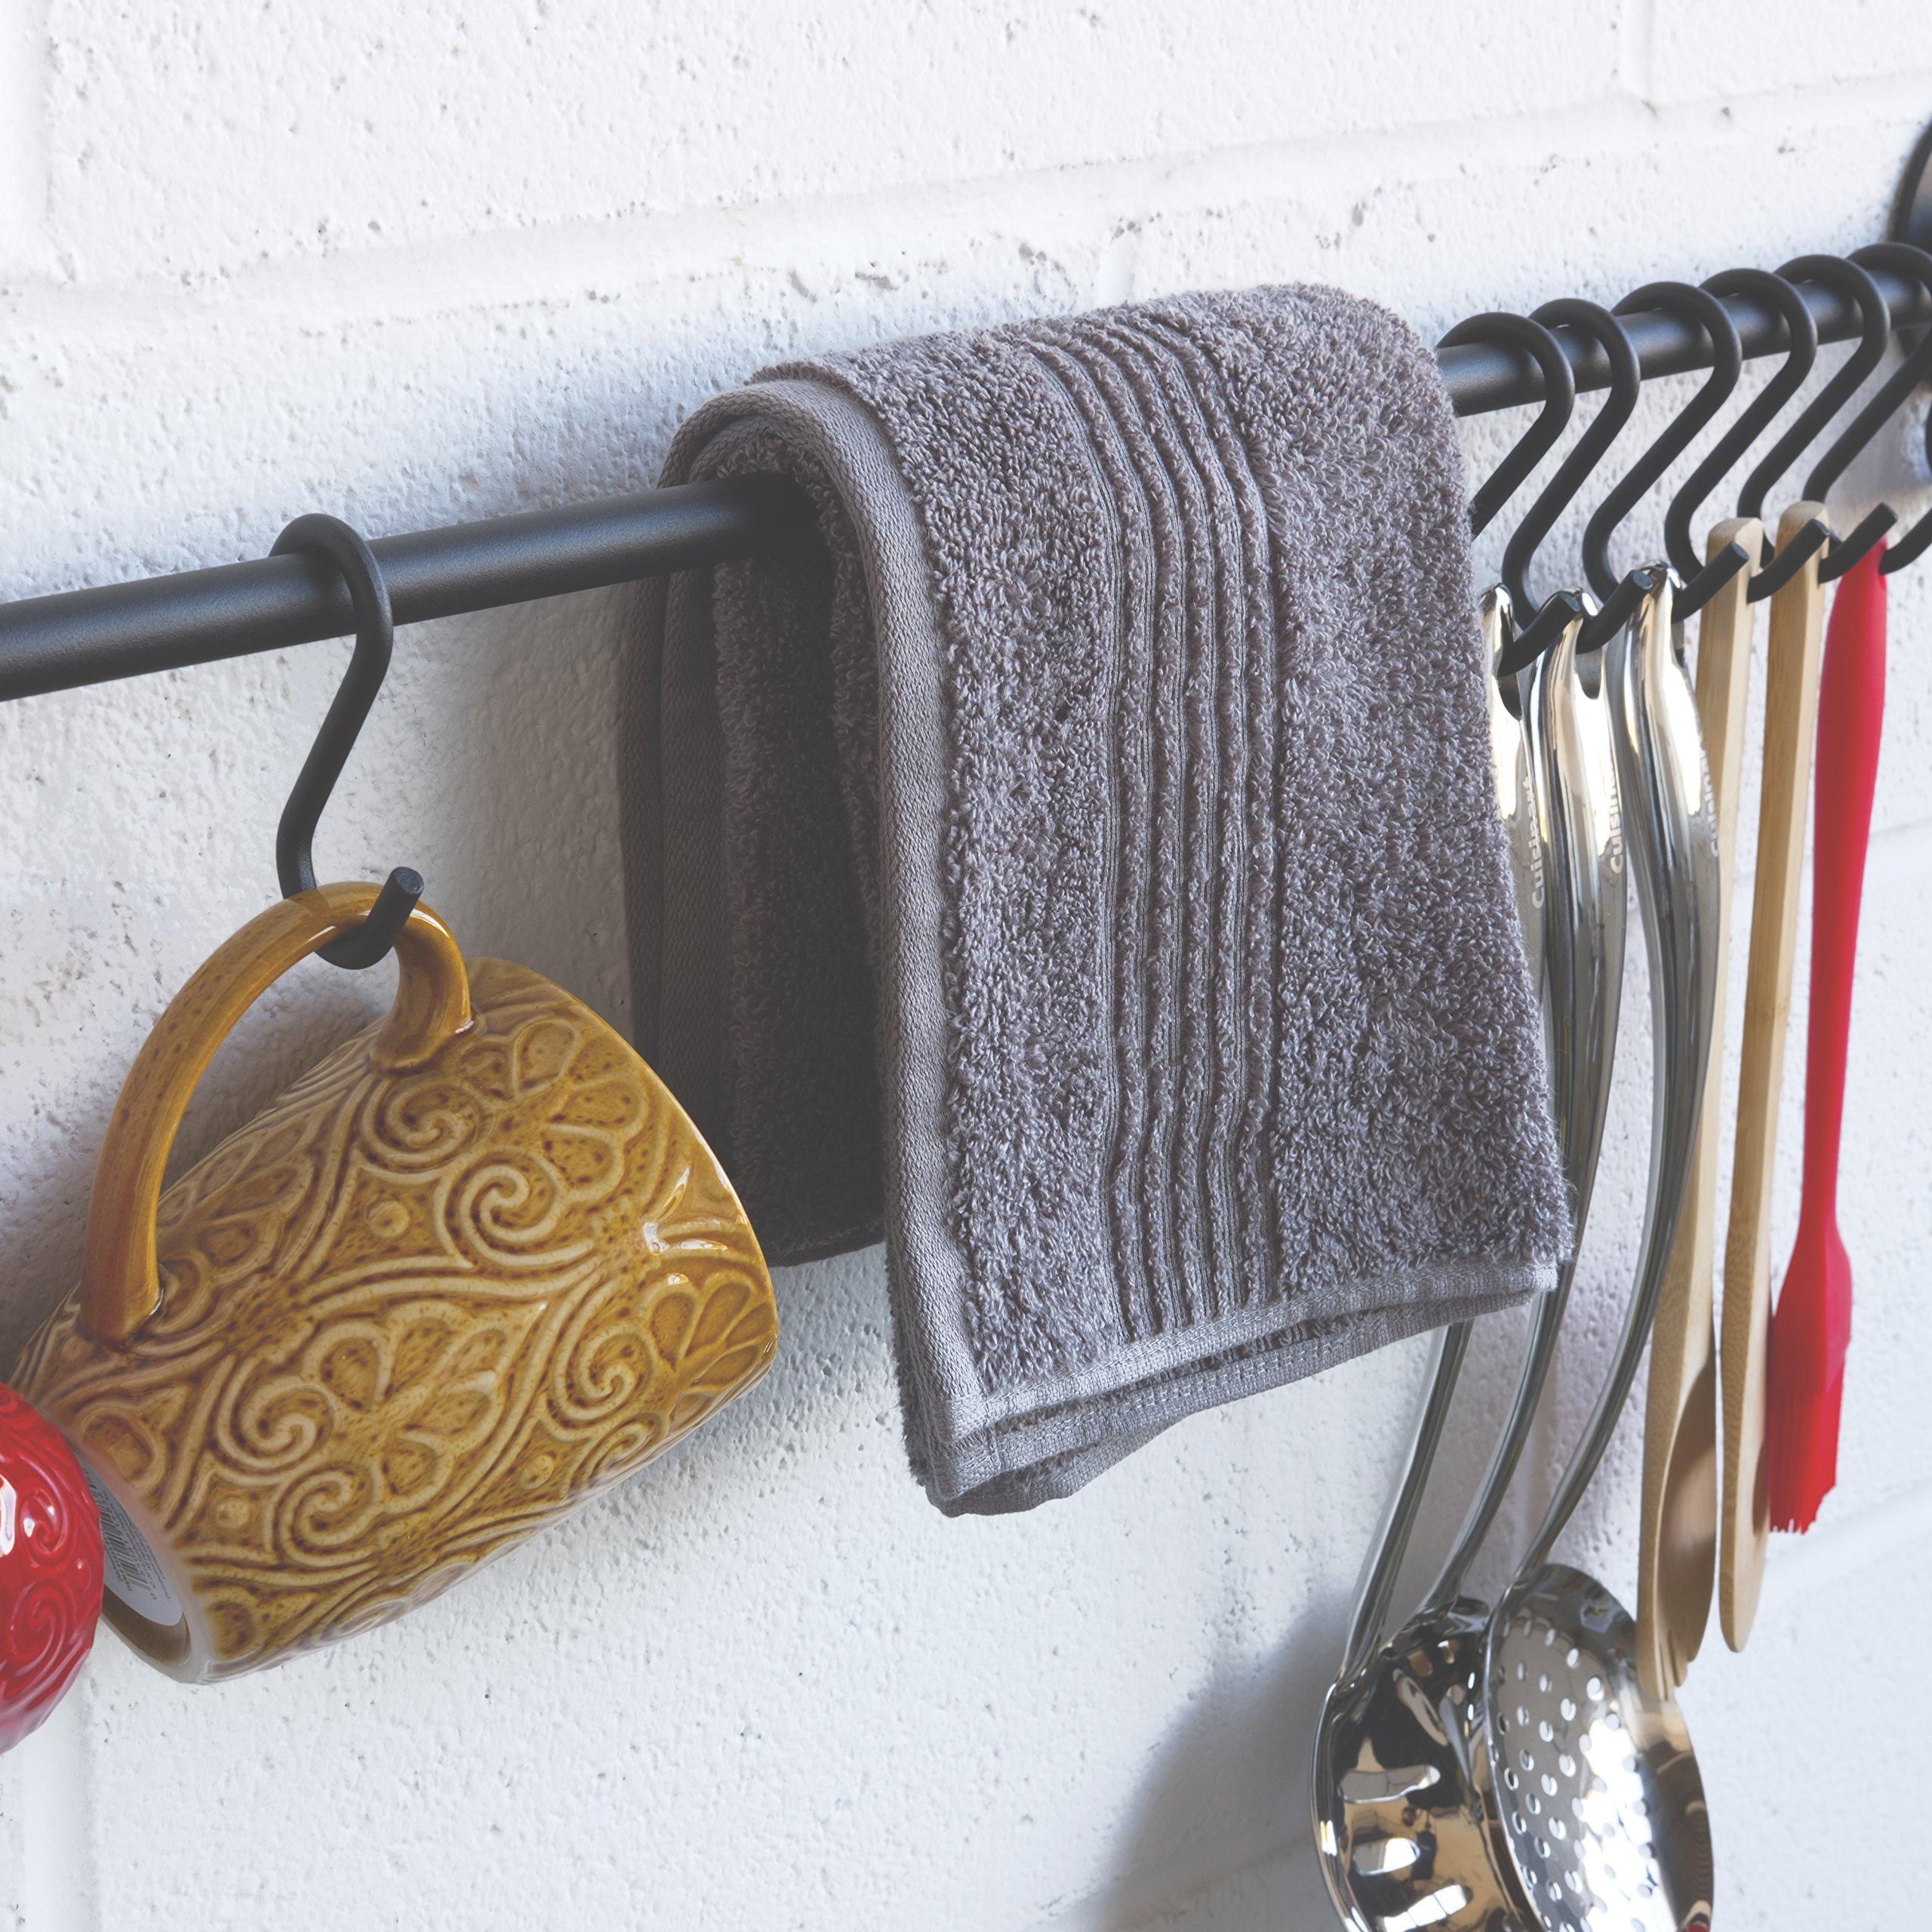 Wallniture Pot Pan Lid Rack Hanging Utensils Rail with Hooks Iron Black 33 Inch by Wallniture (Image #3)